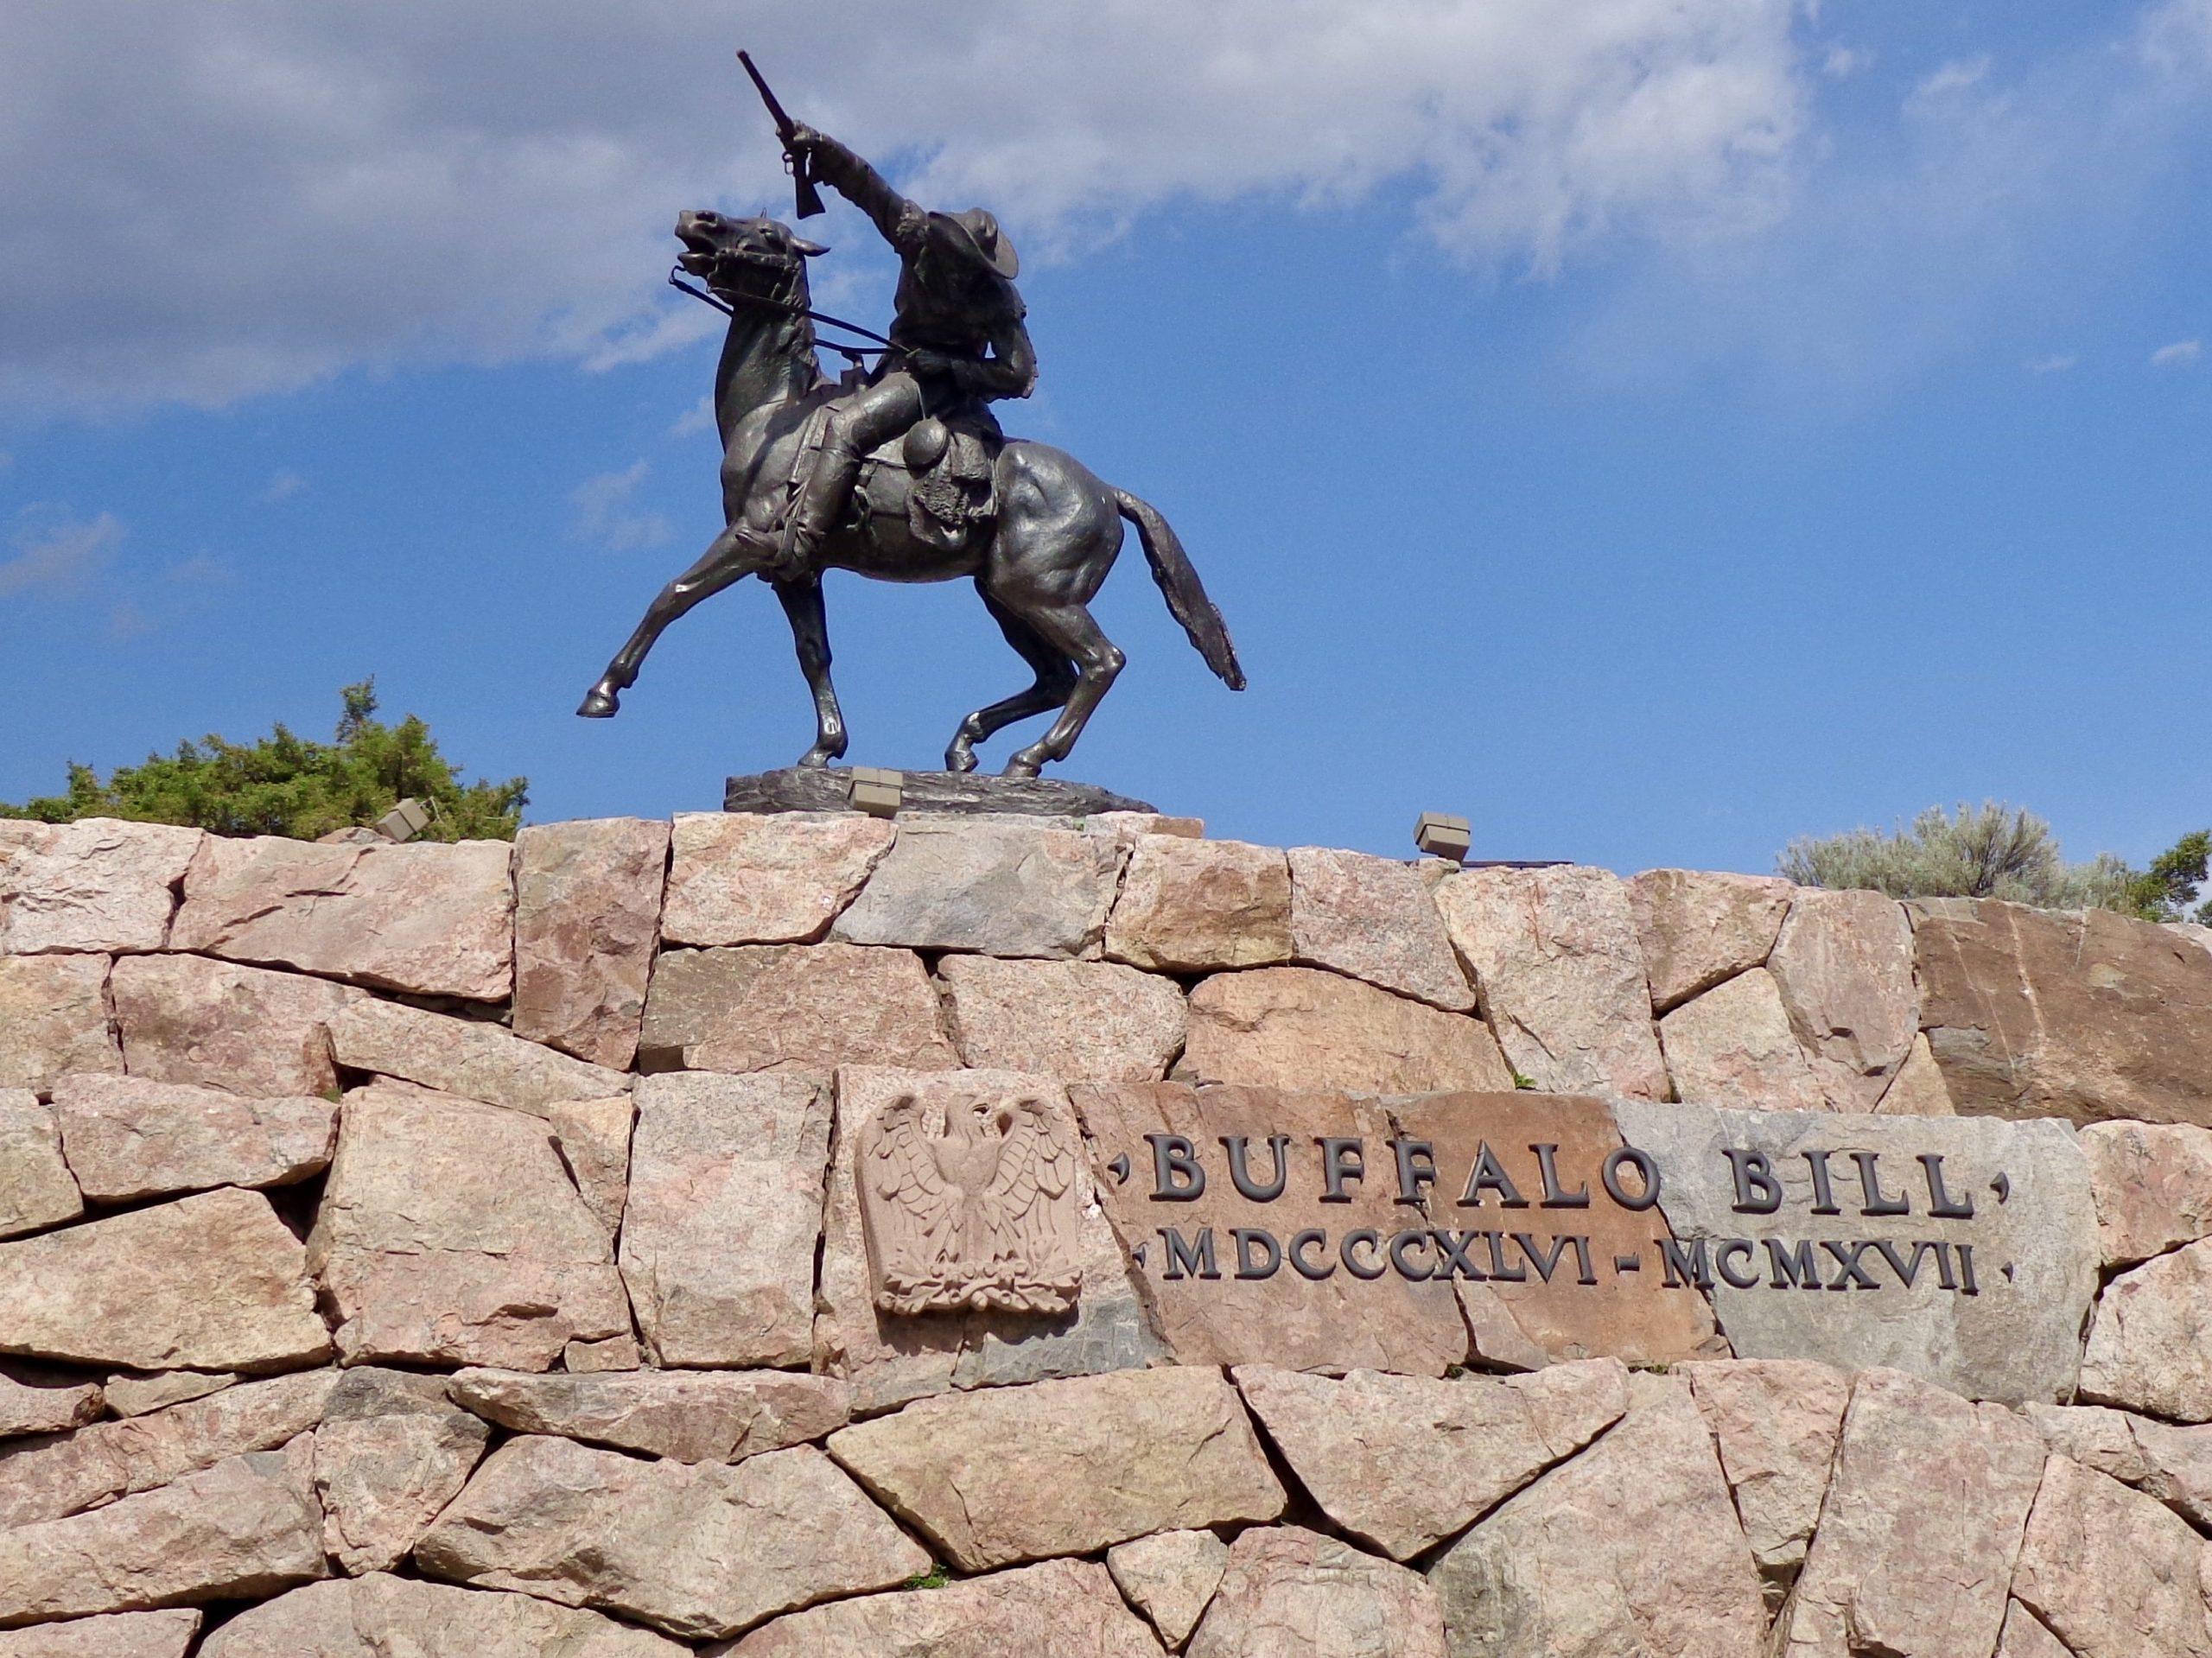 Standbeeld Buffalo Bill in Cody, Wyoming